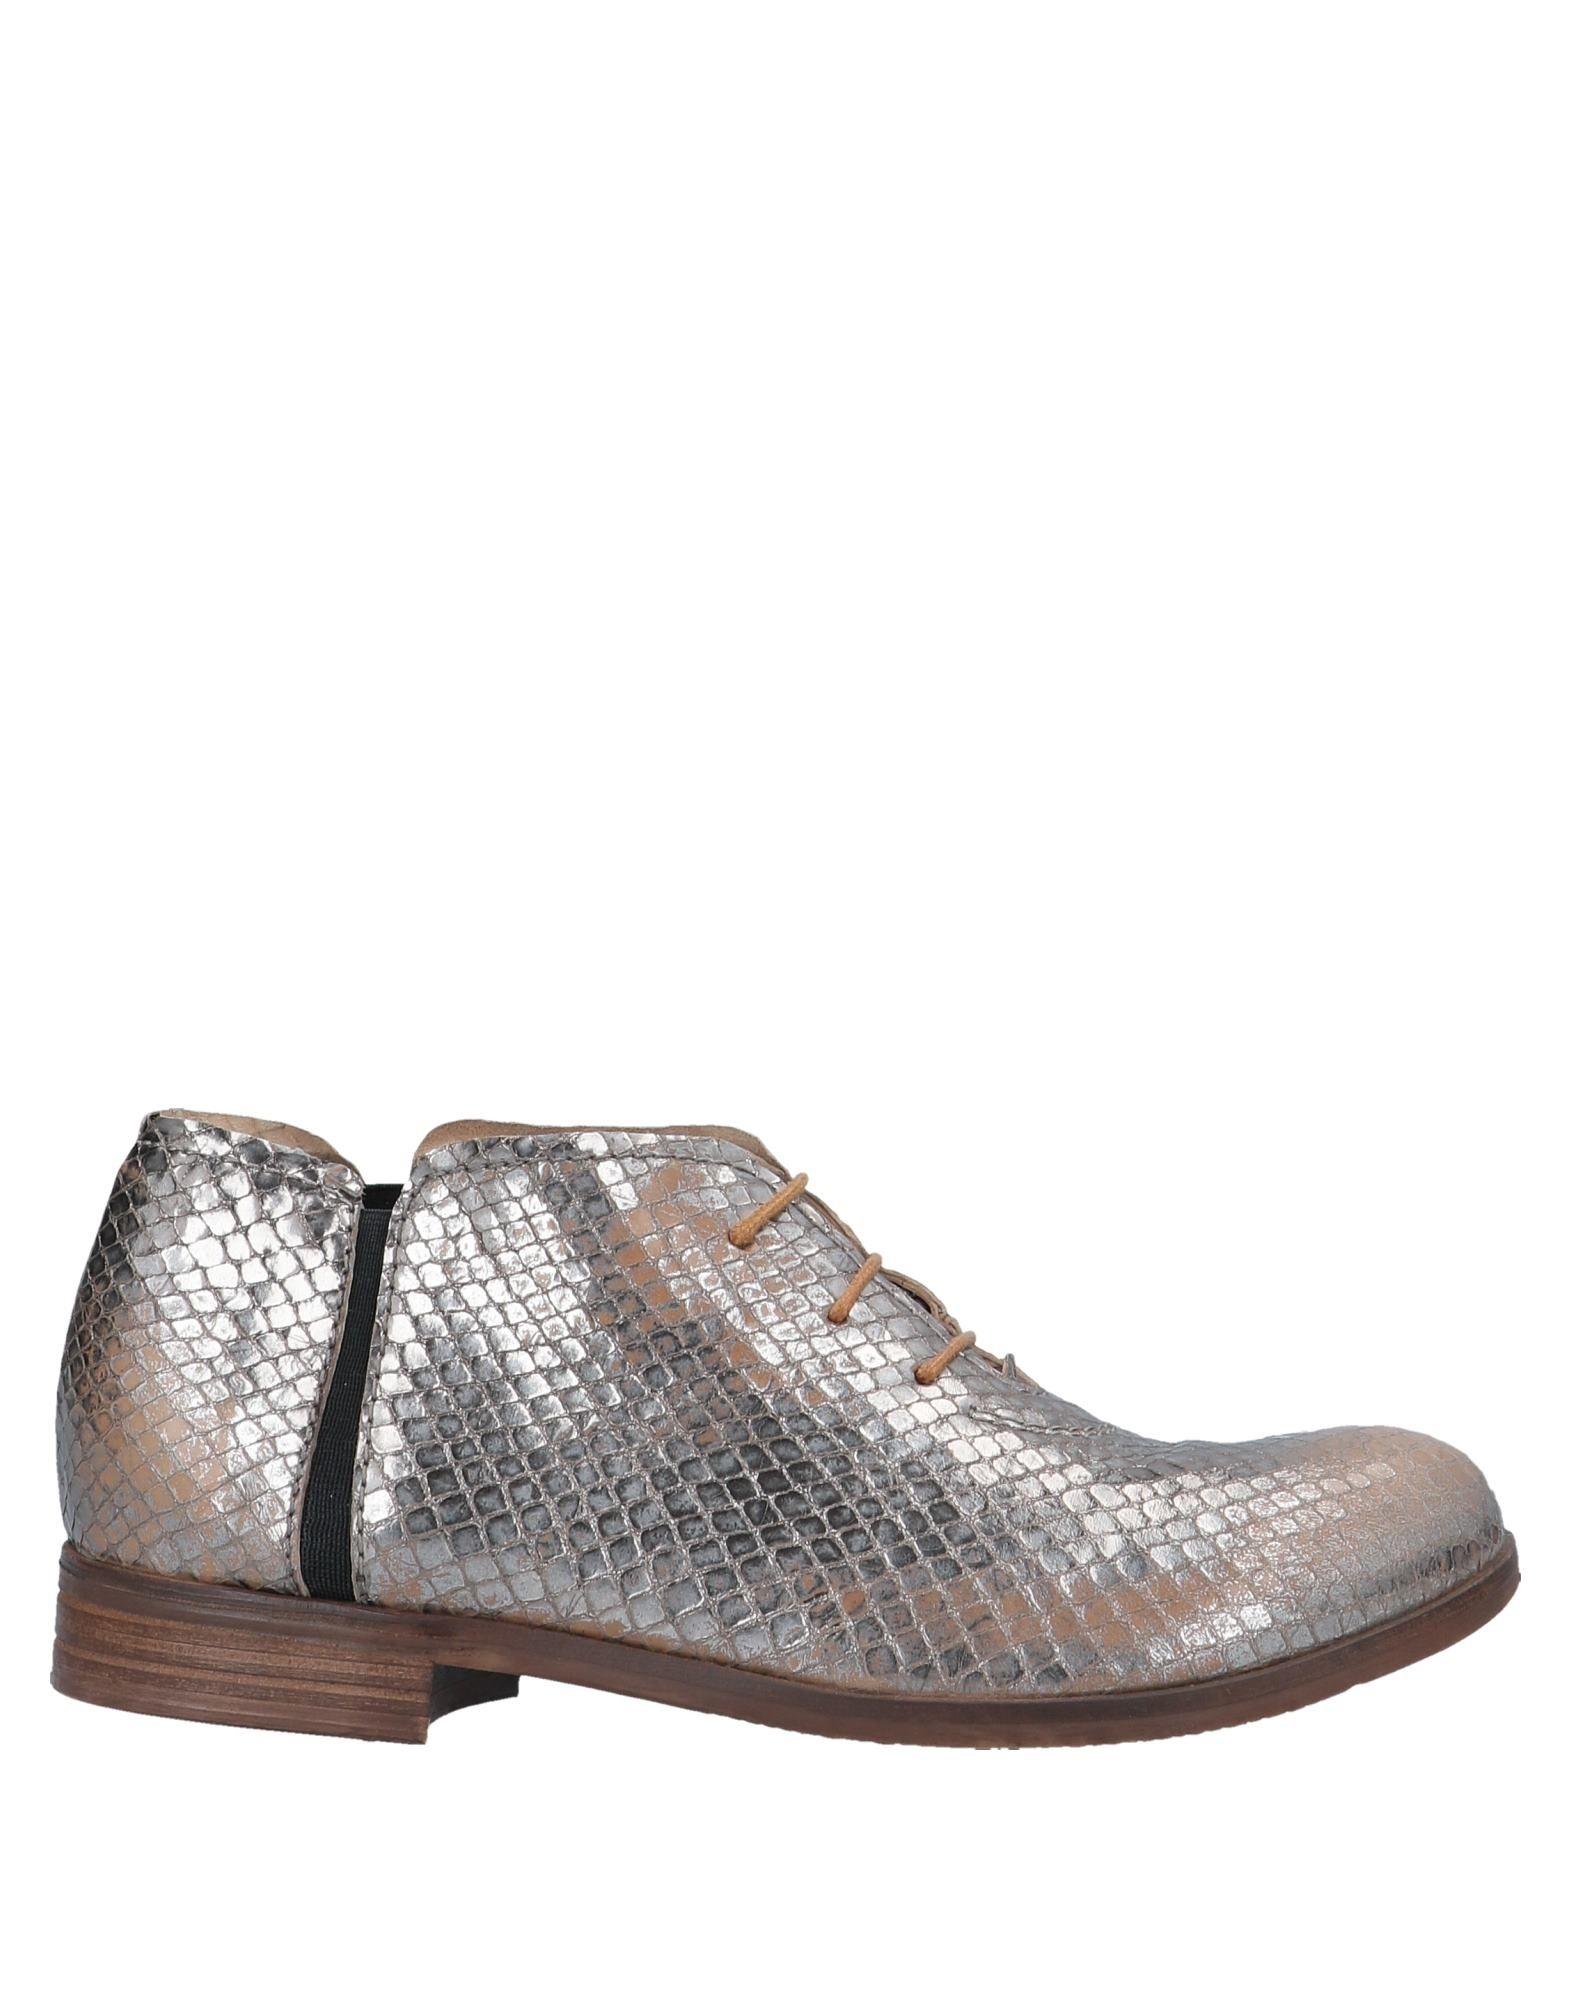 STUDIO BY VOLPATO Обувь на шнурках my studio обувь на шнурках